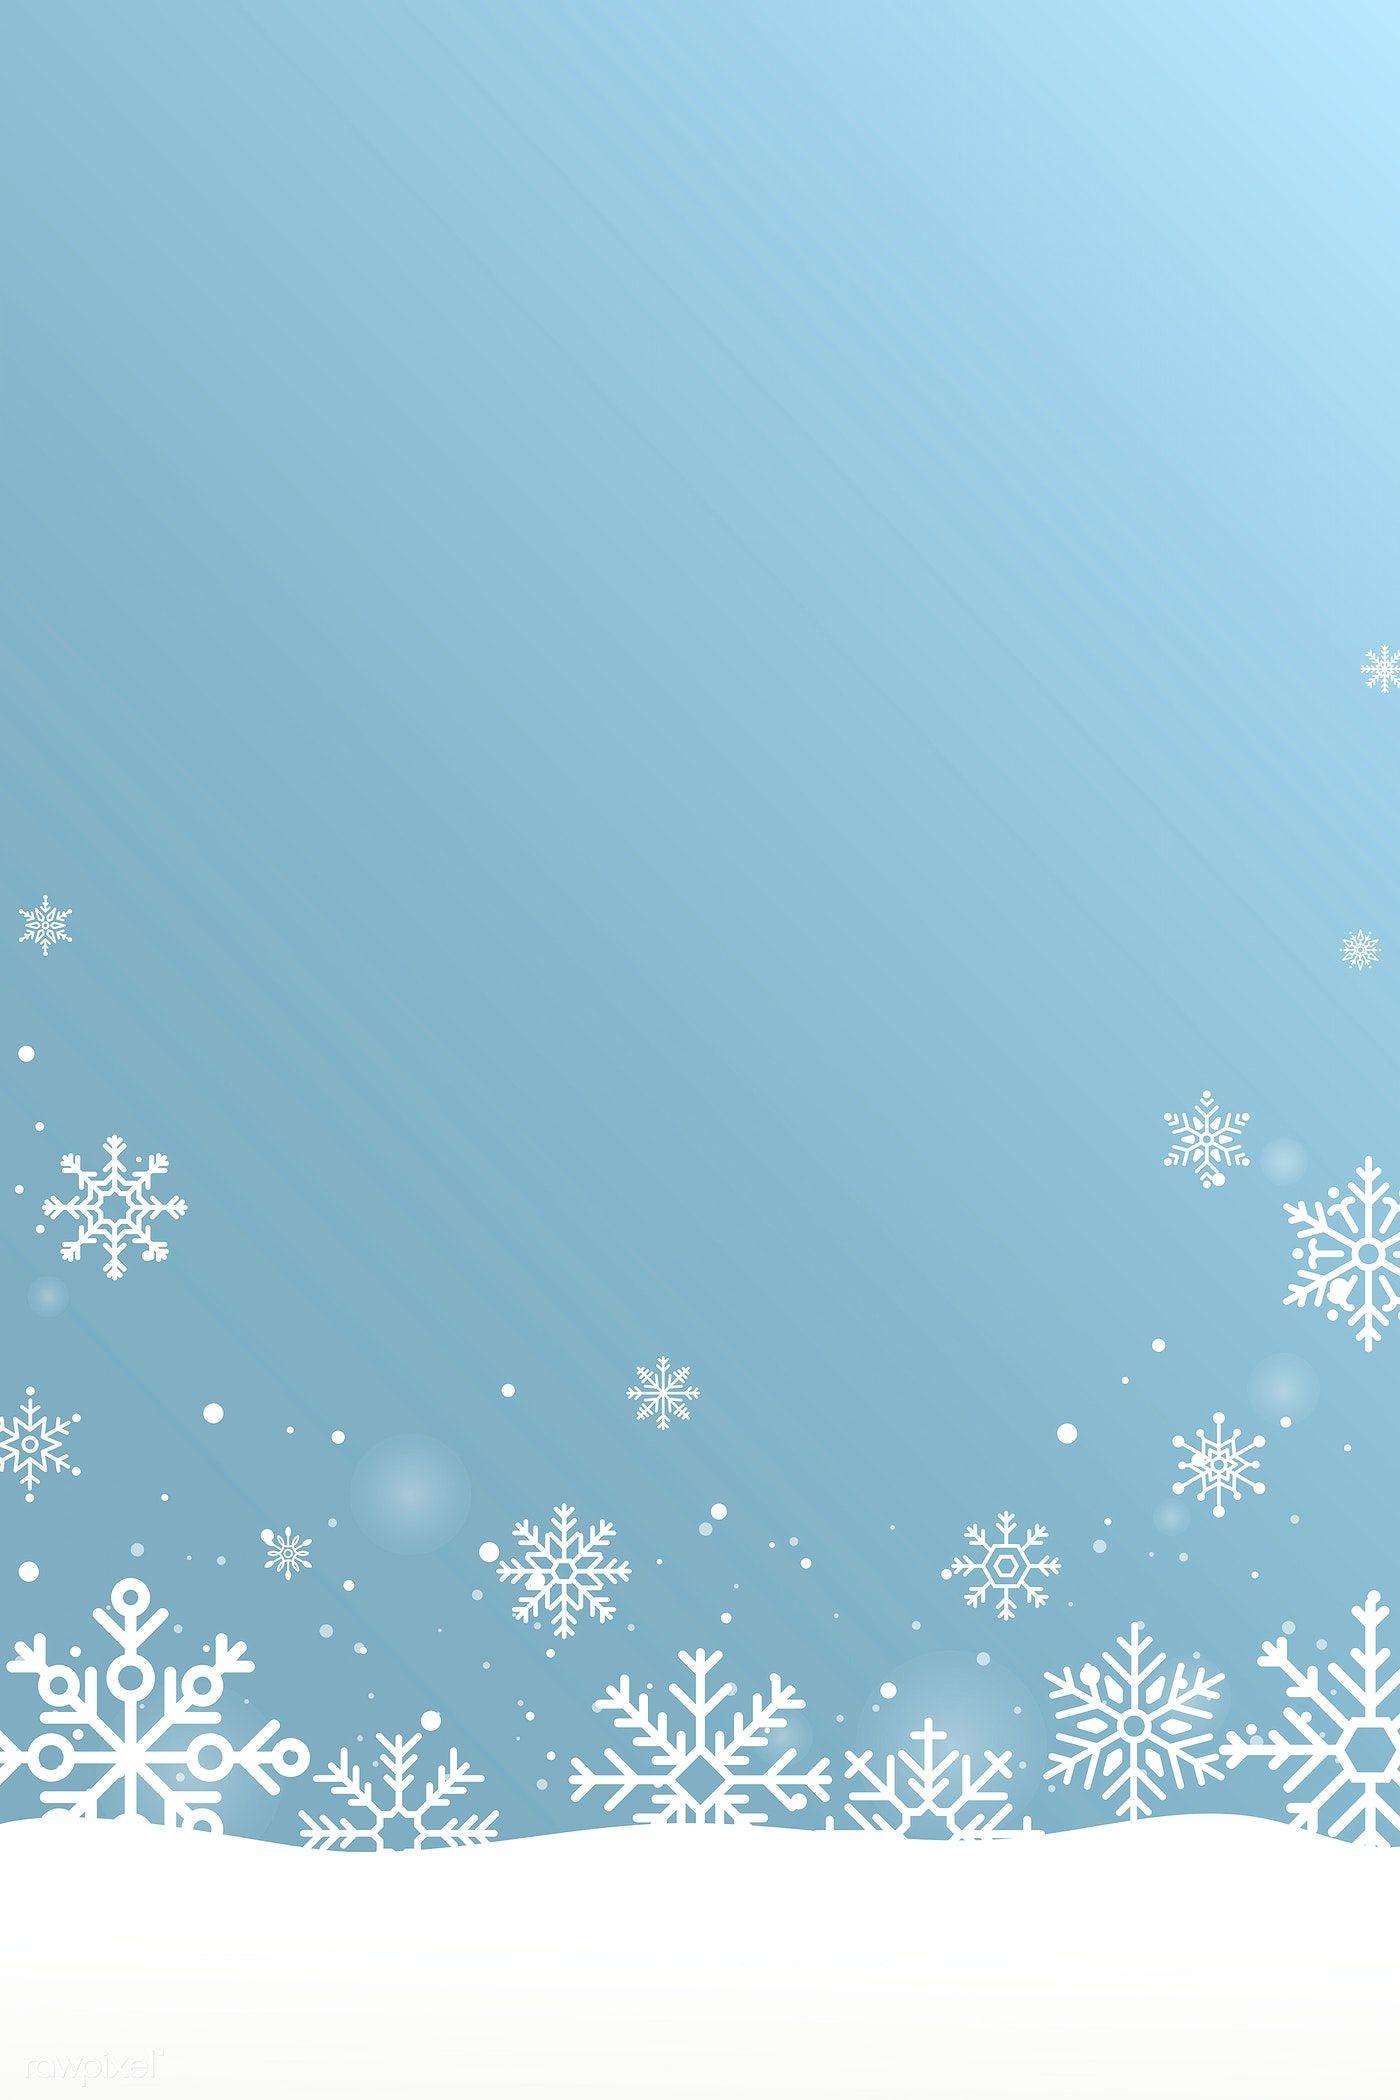 Download premium vector of Blue snowflake Christmas frame